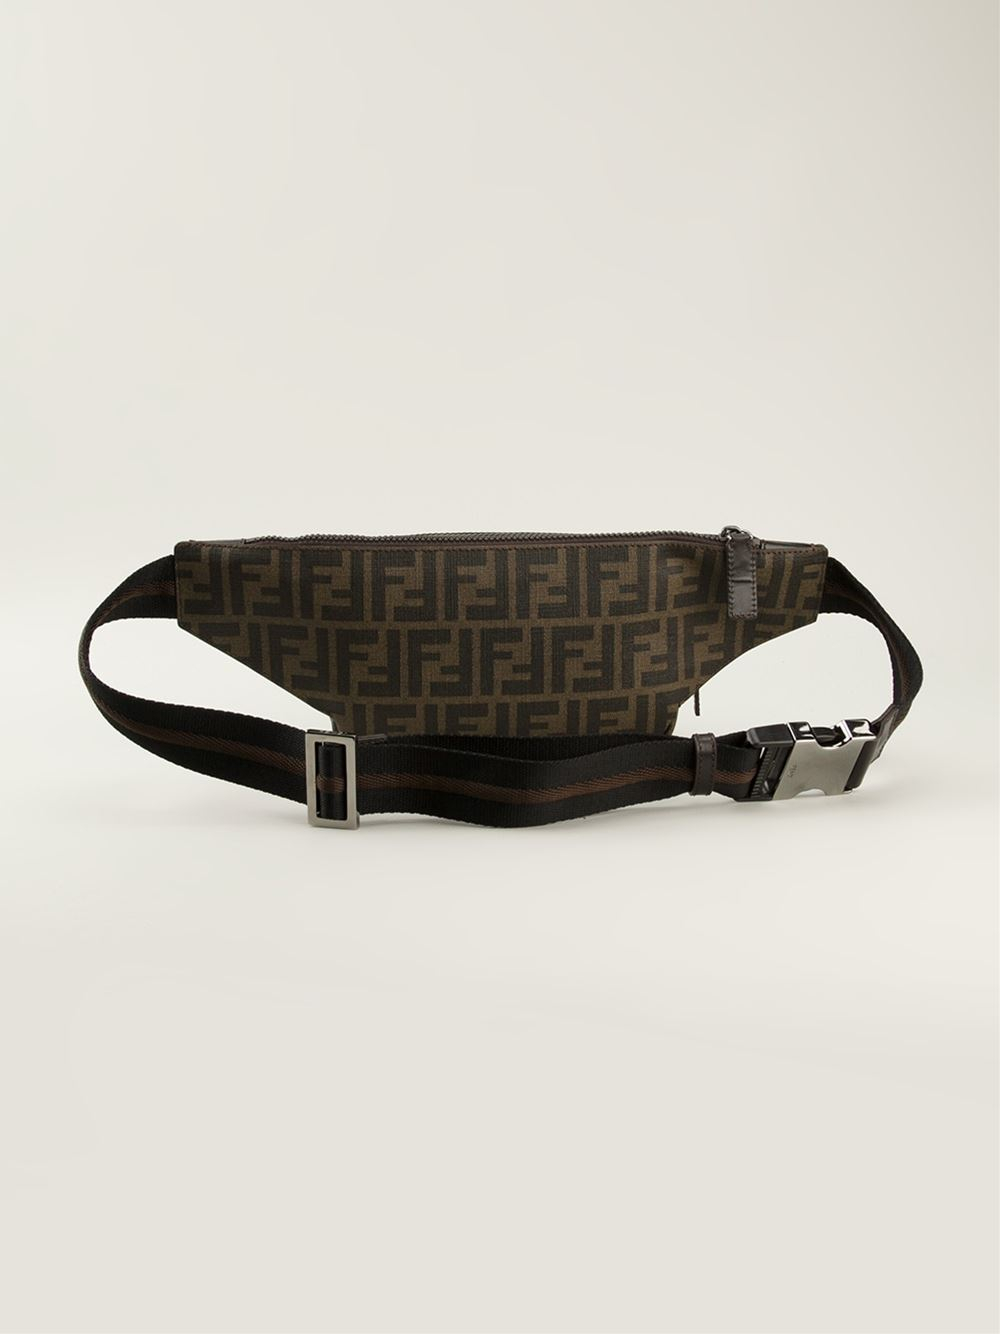 36054baf4207 Fendi Zucca Belt Bag - The Best Belt Produck